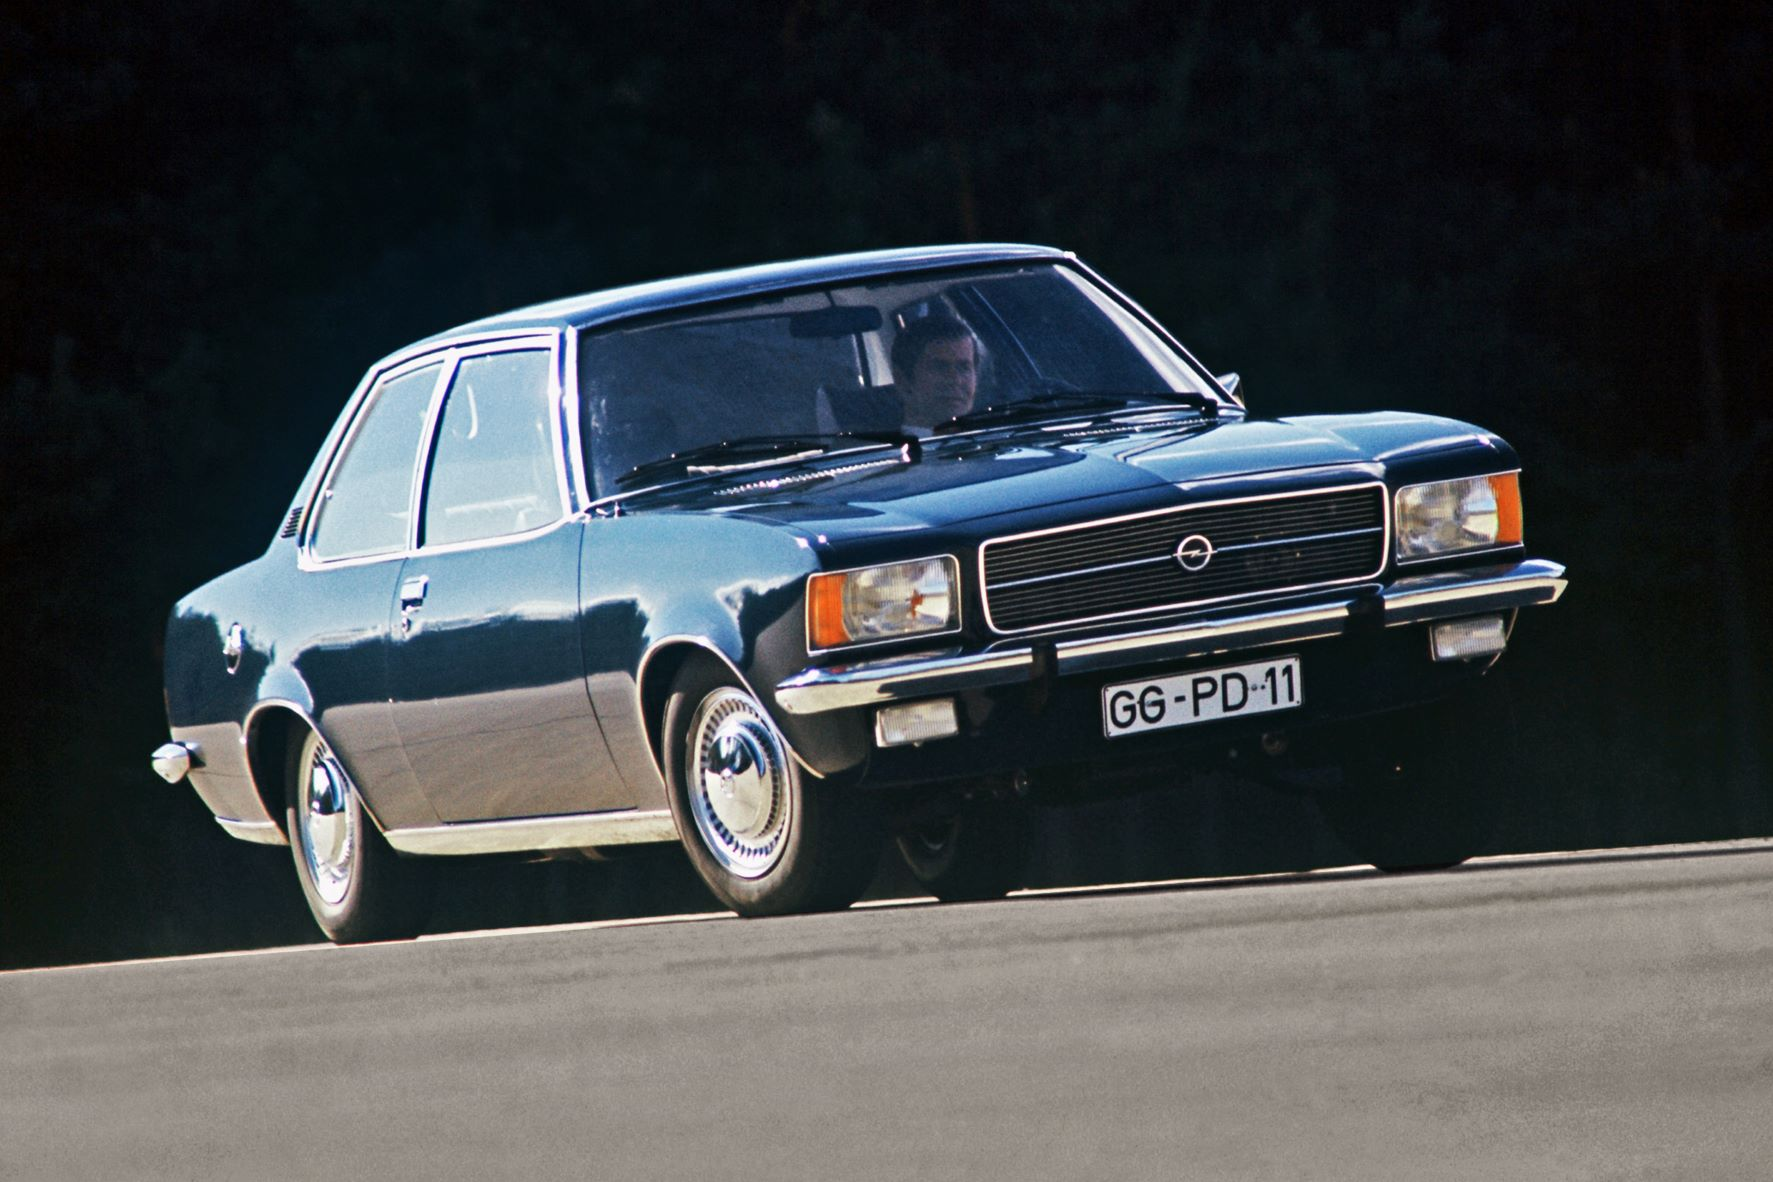 Opel Rekord D modelo emblemático de Rüsselsheim celebra 50 anos 15